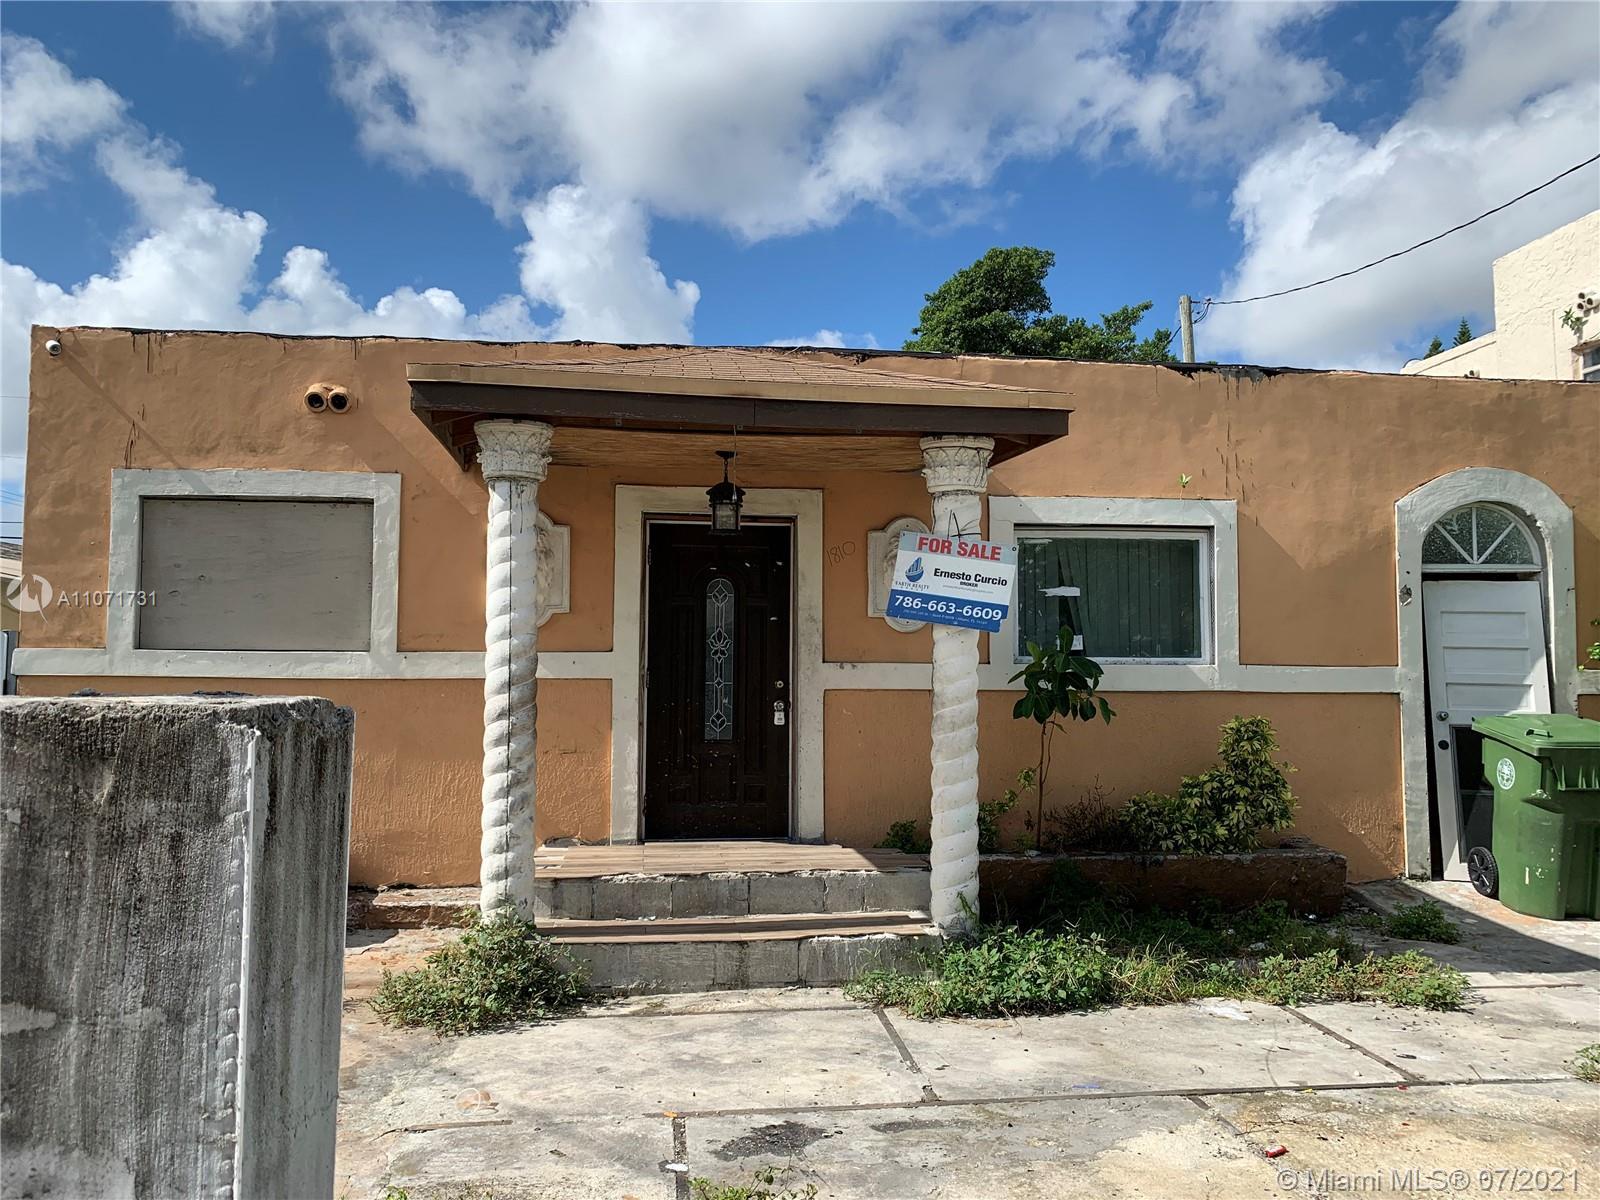 1810 46th St, Miami, Florida 33142